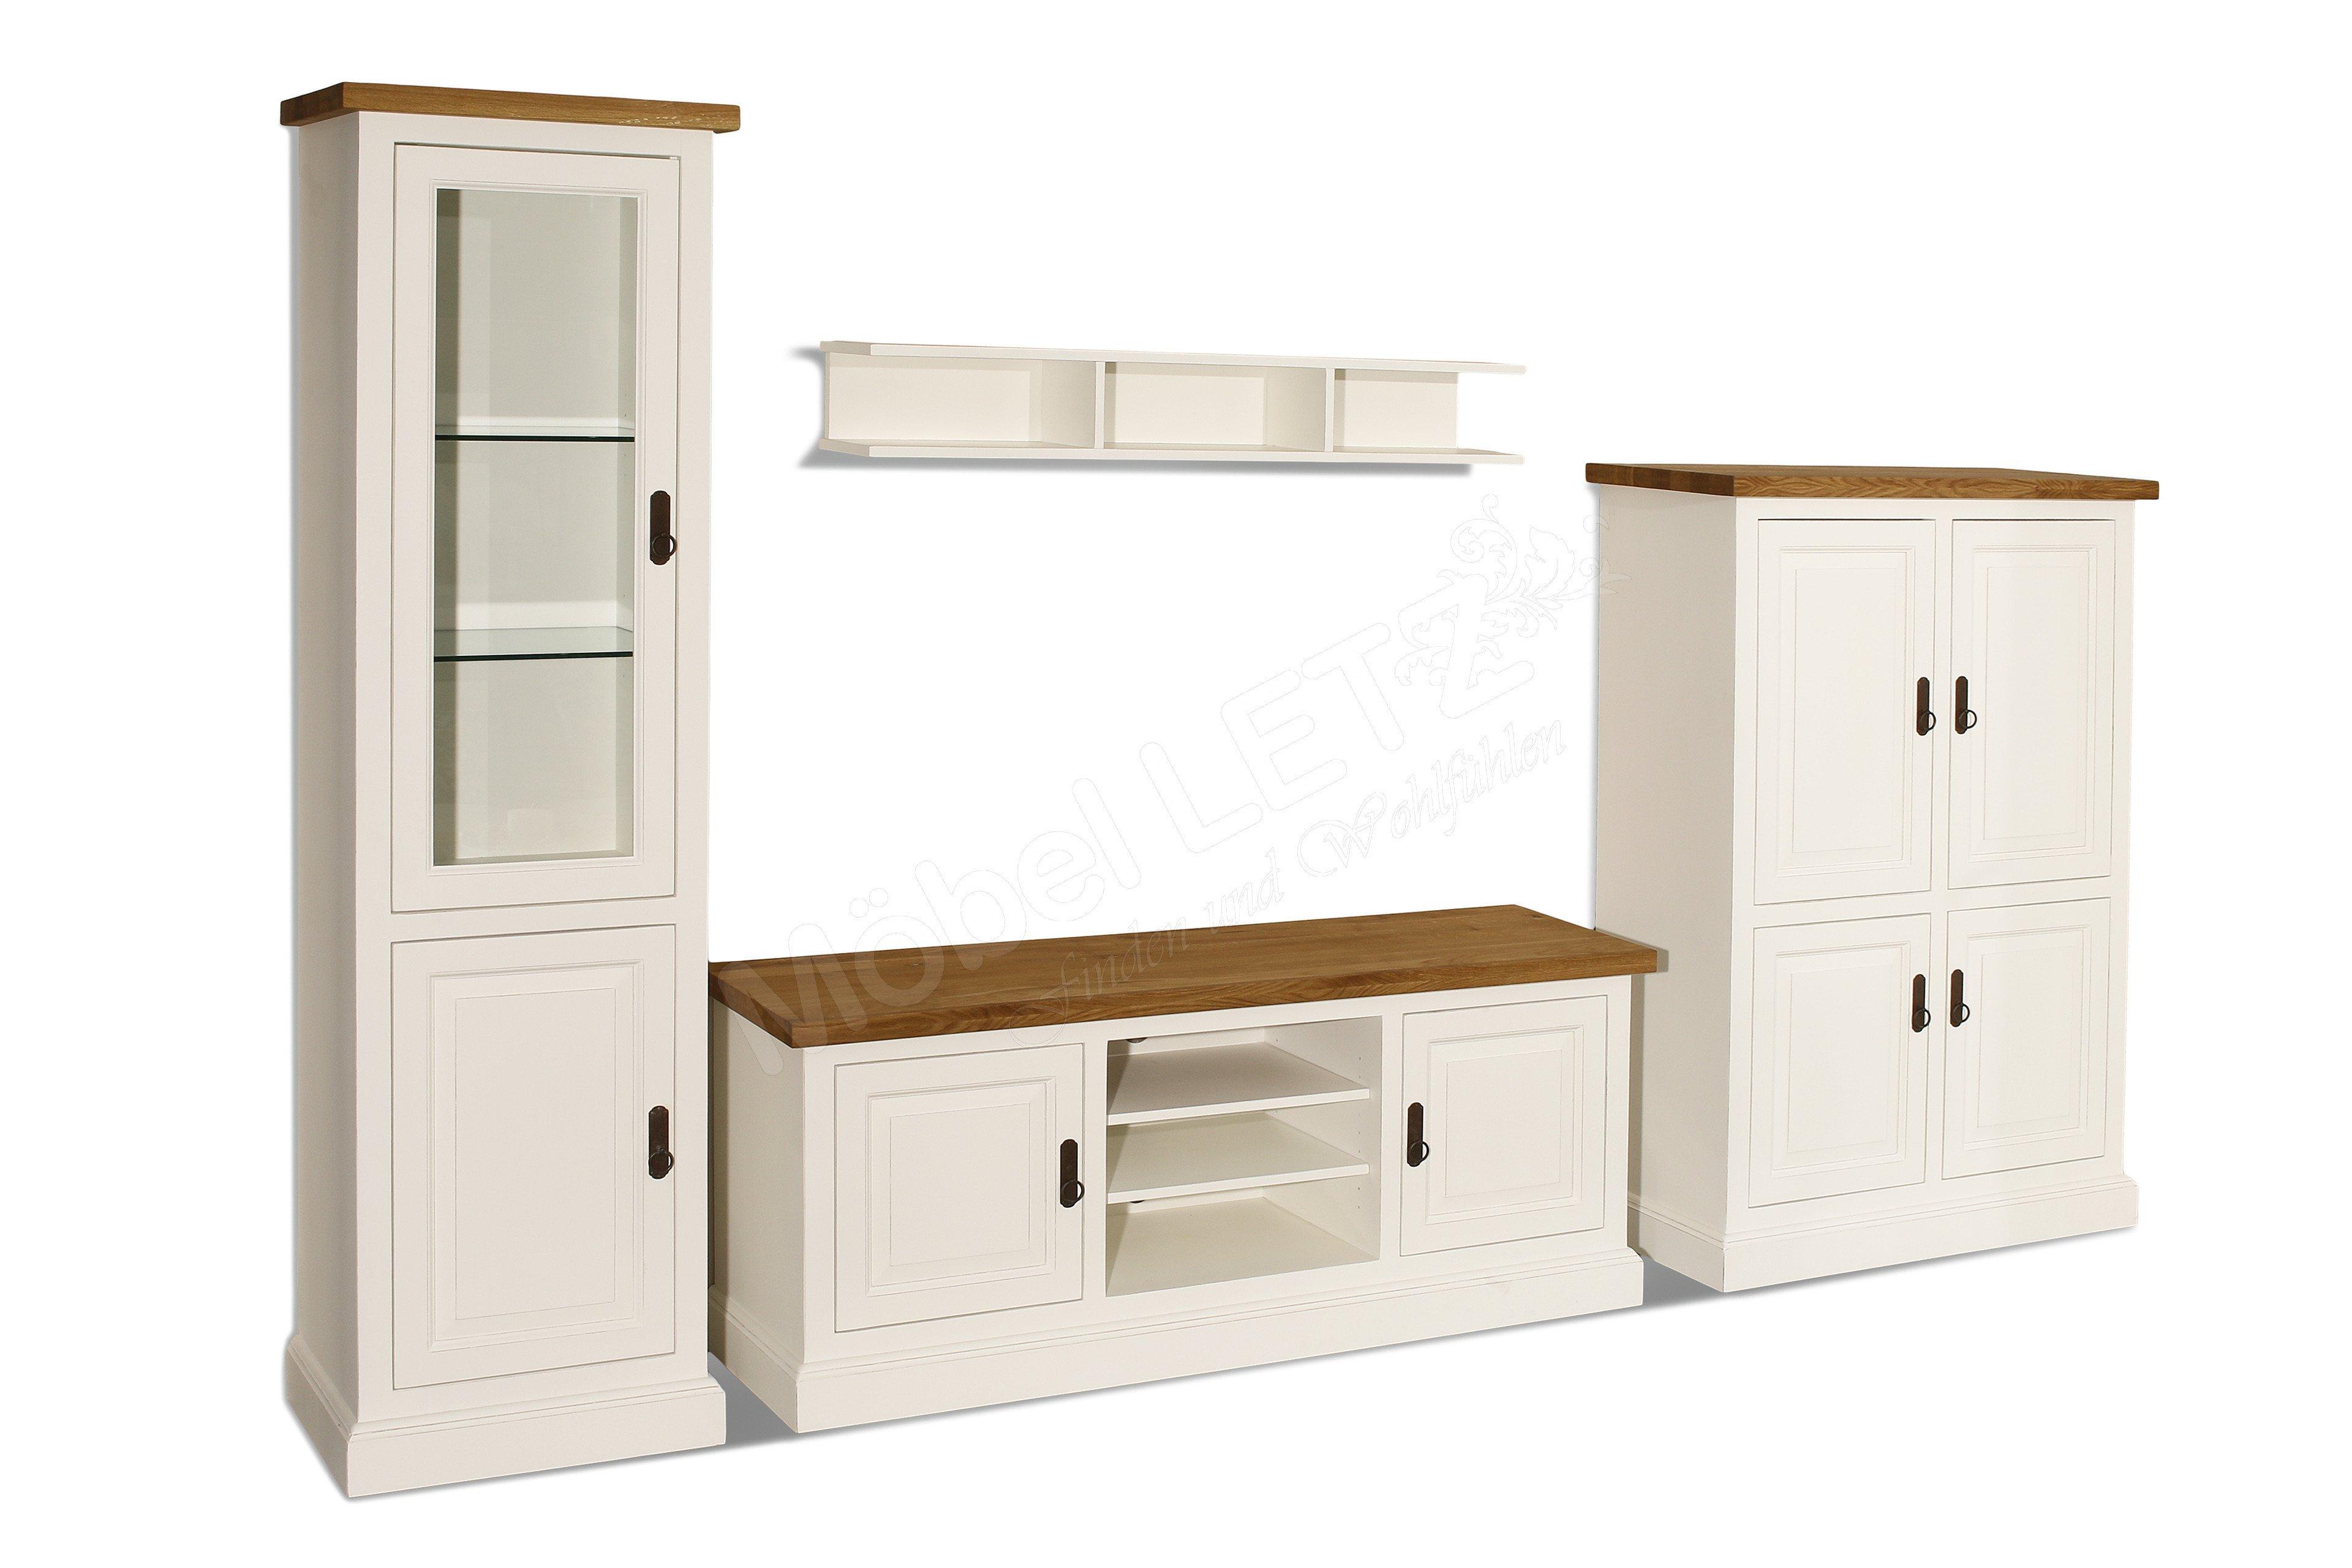 ludwik styl wohnwand toulon massivholz wei m bel letz ihr online shop. Black Bedroom Furniture Sets. Home Design Ideas